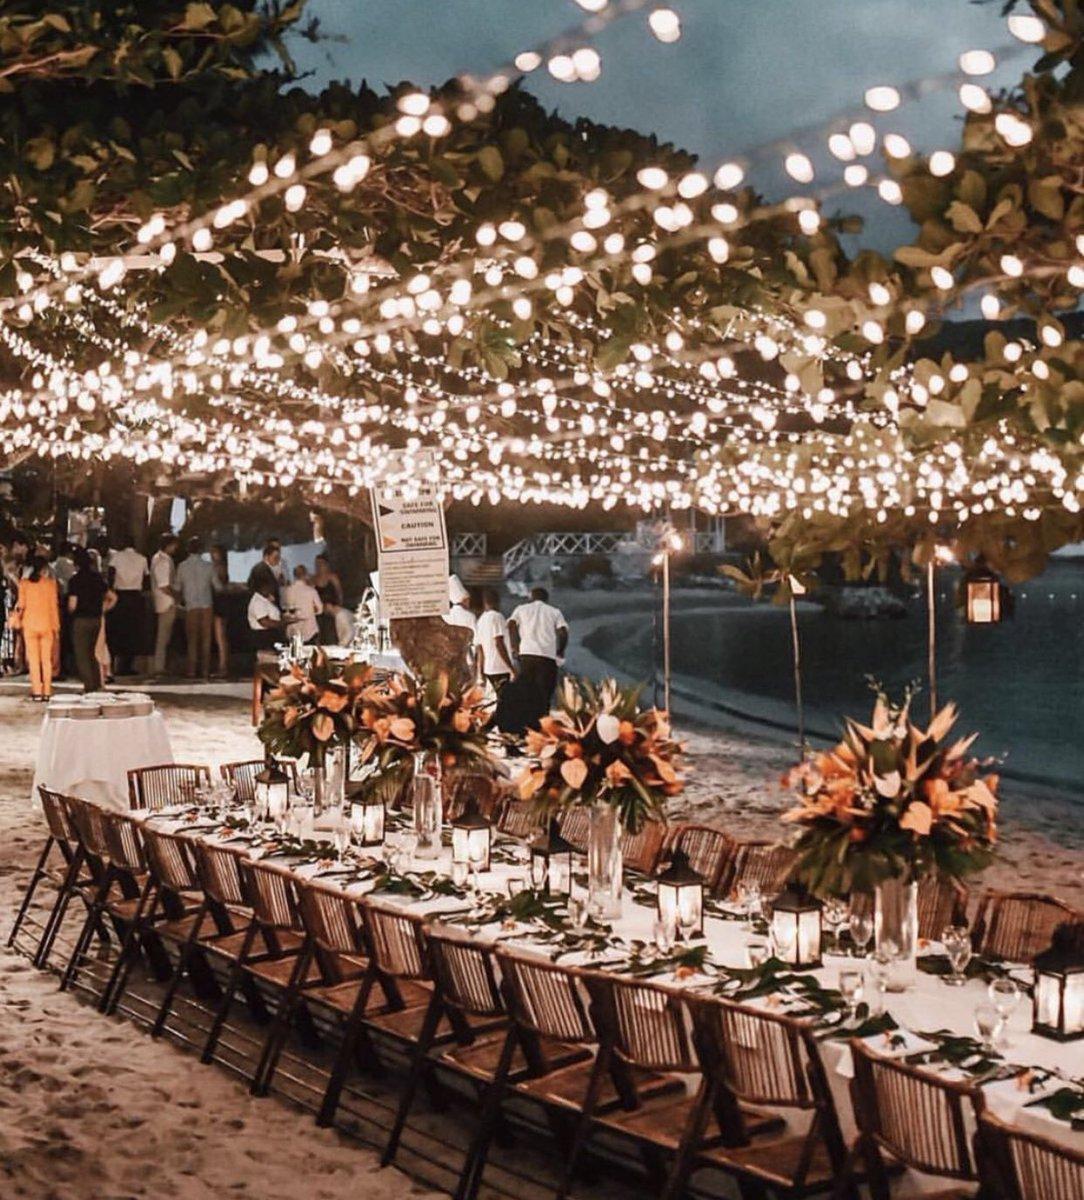 76b88de5761 bridaldress weddingdress weddingfashion bridalstyle brides bridal  instawedding whitedress fashion weddingday bridalfashion